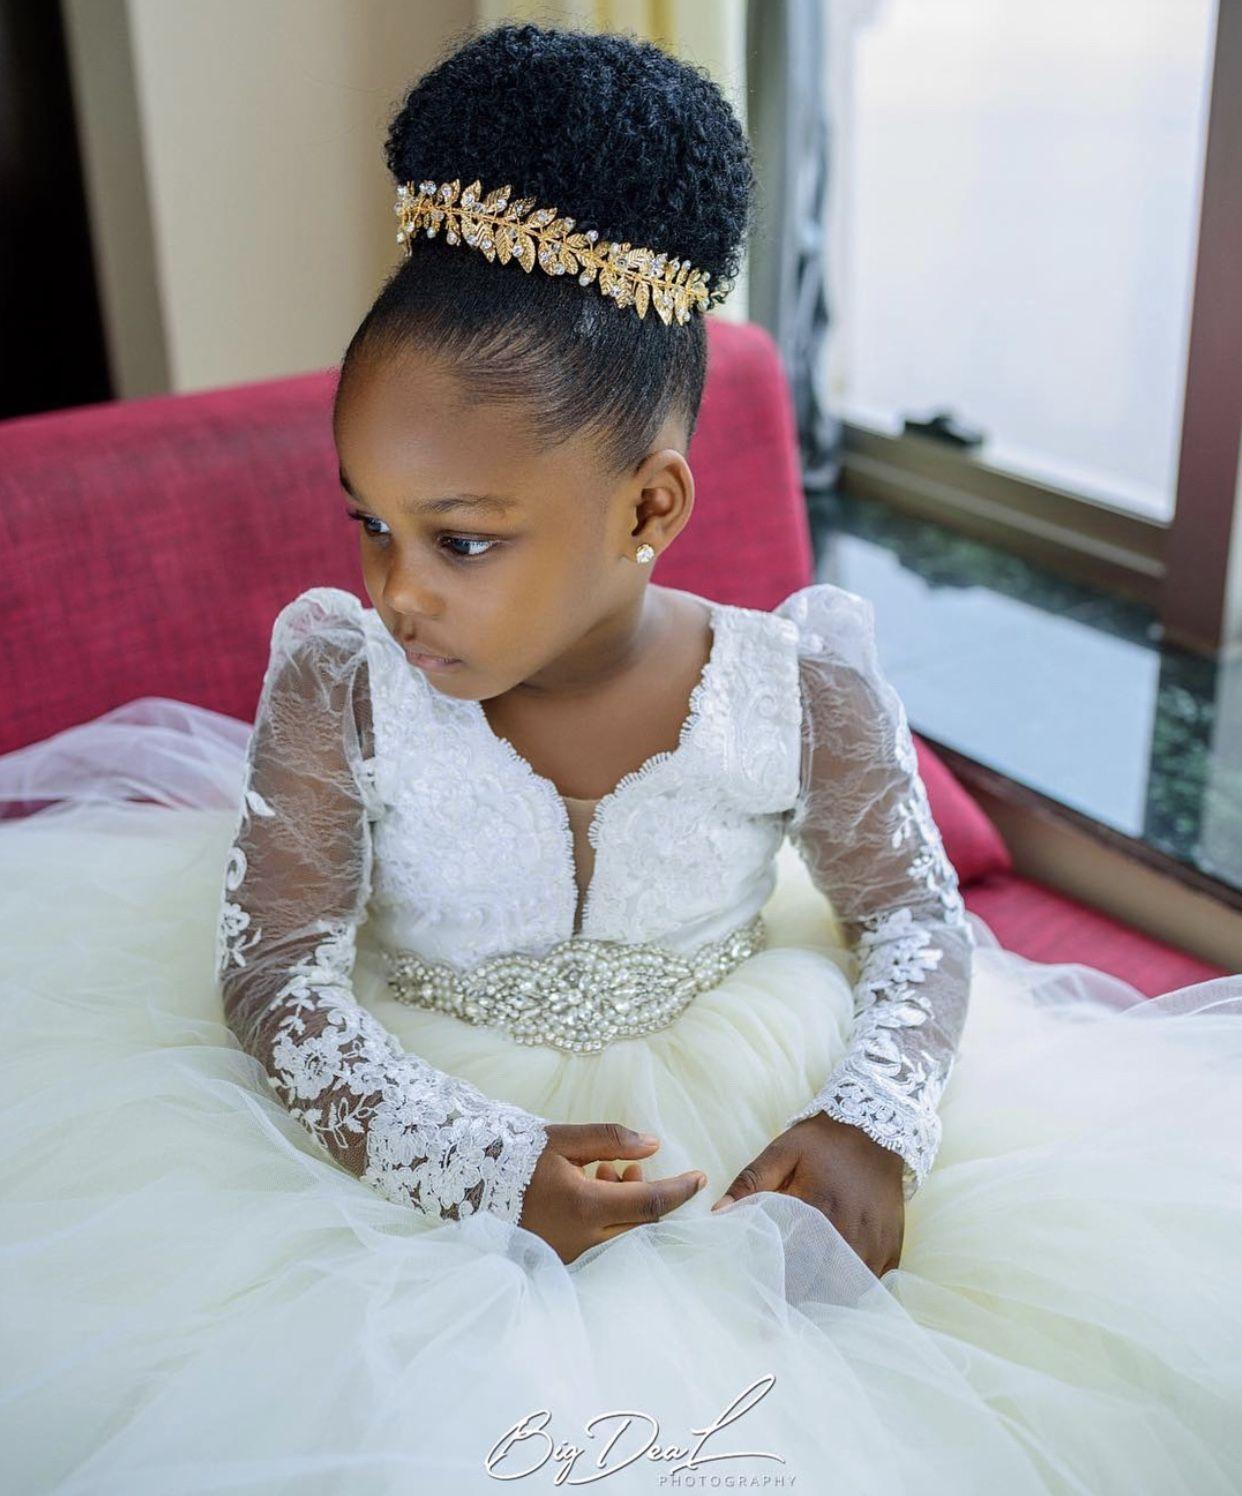 Pin By Karen Fertil On Wedding Day Wedding Hairstyles For Girls